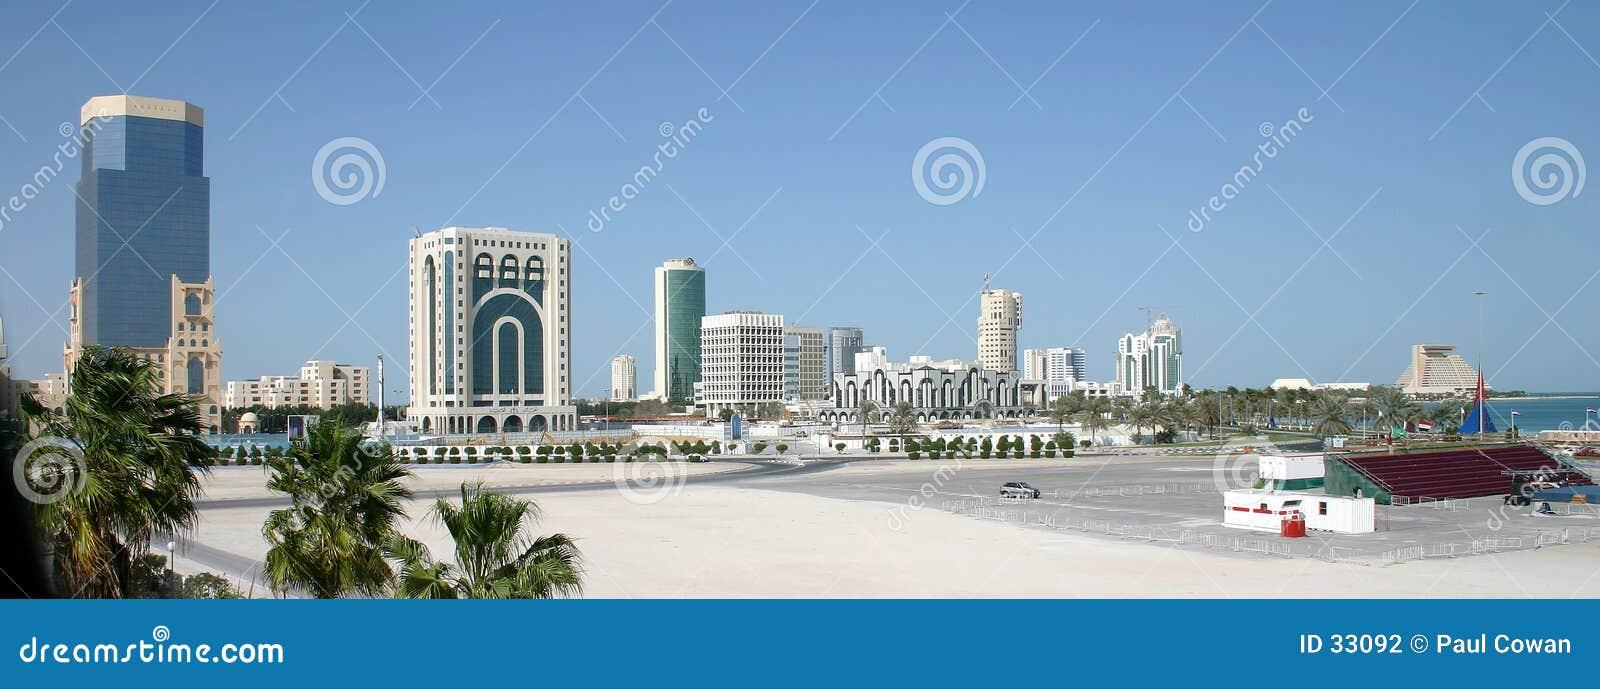 De stadshorizon van Doha